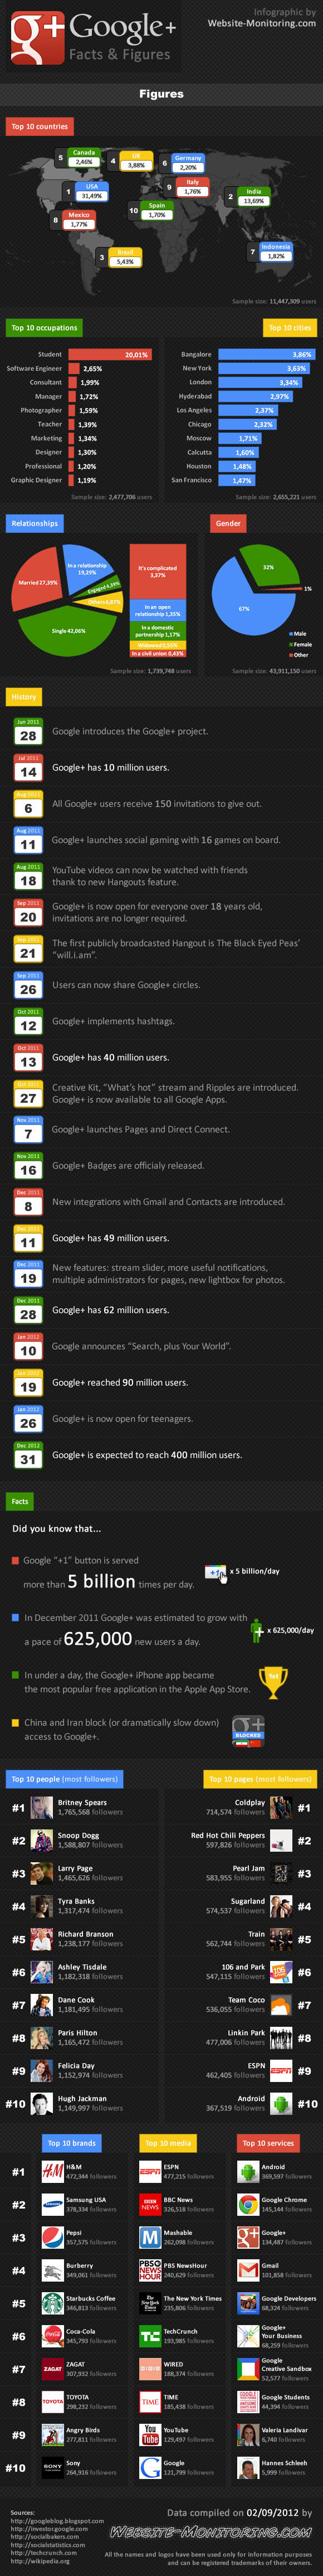 infographie google plus